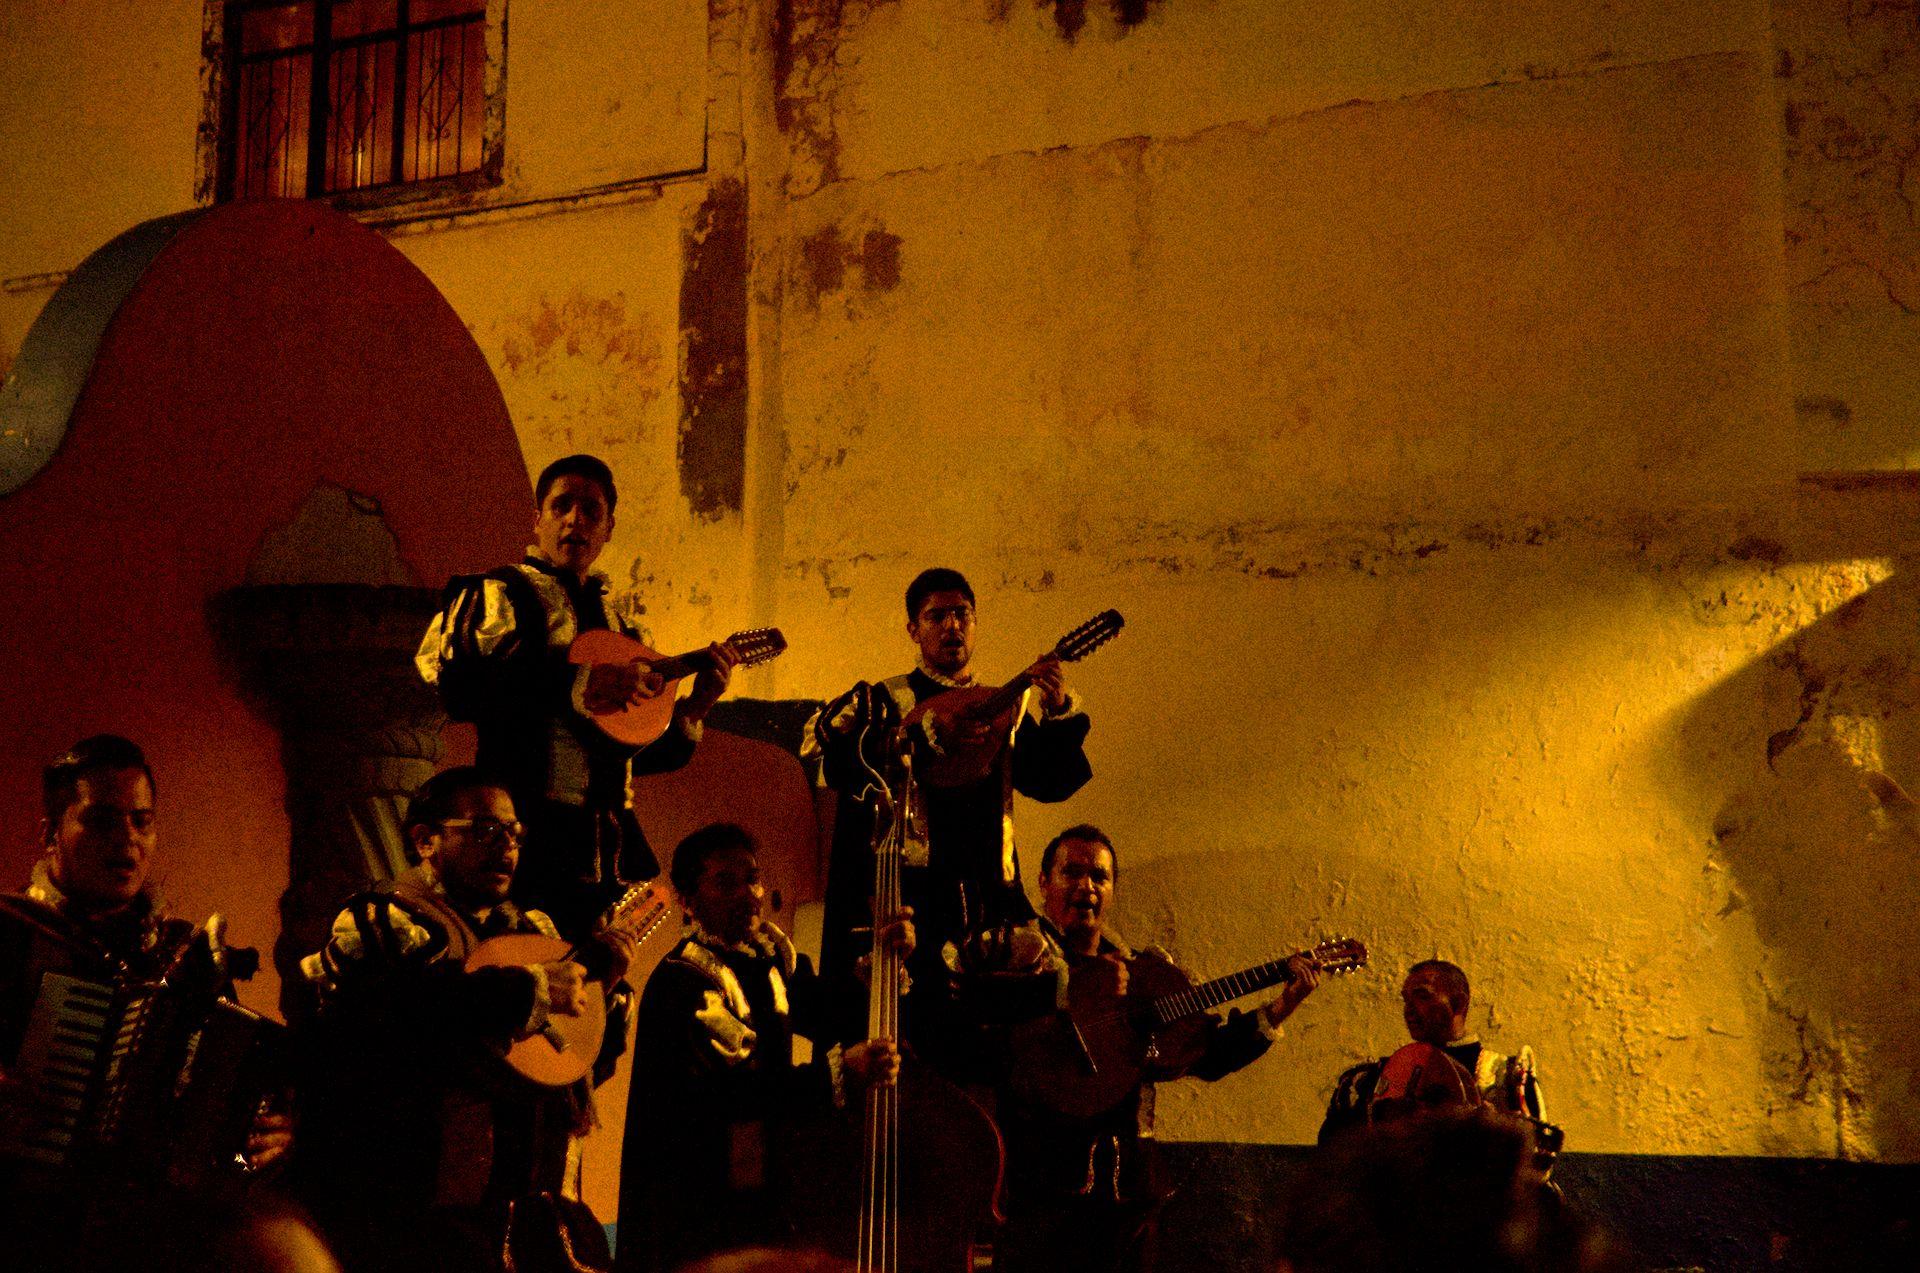 Wunderschöne Farbenpracht in Guanajuato